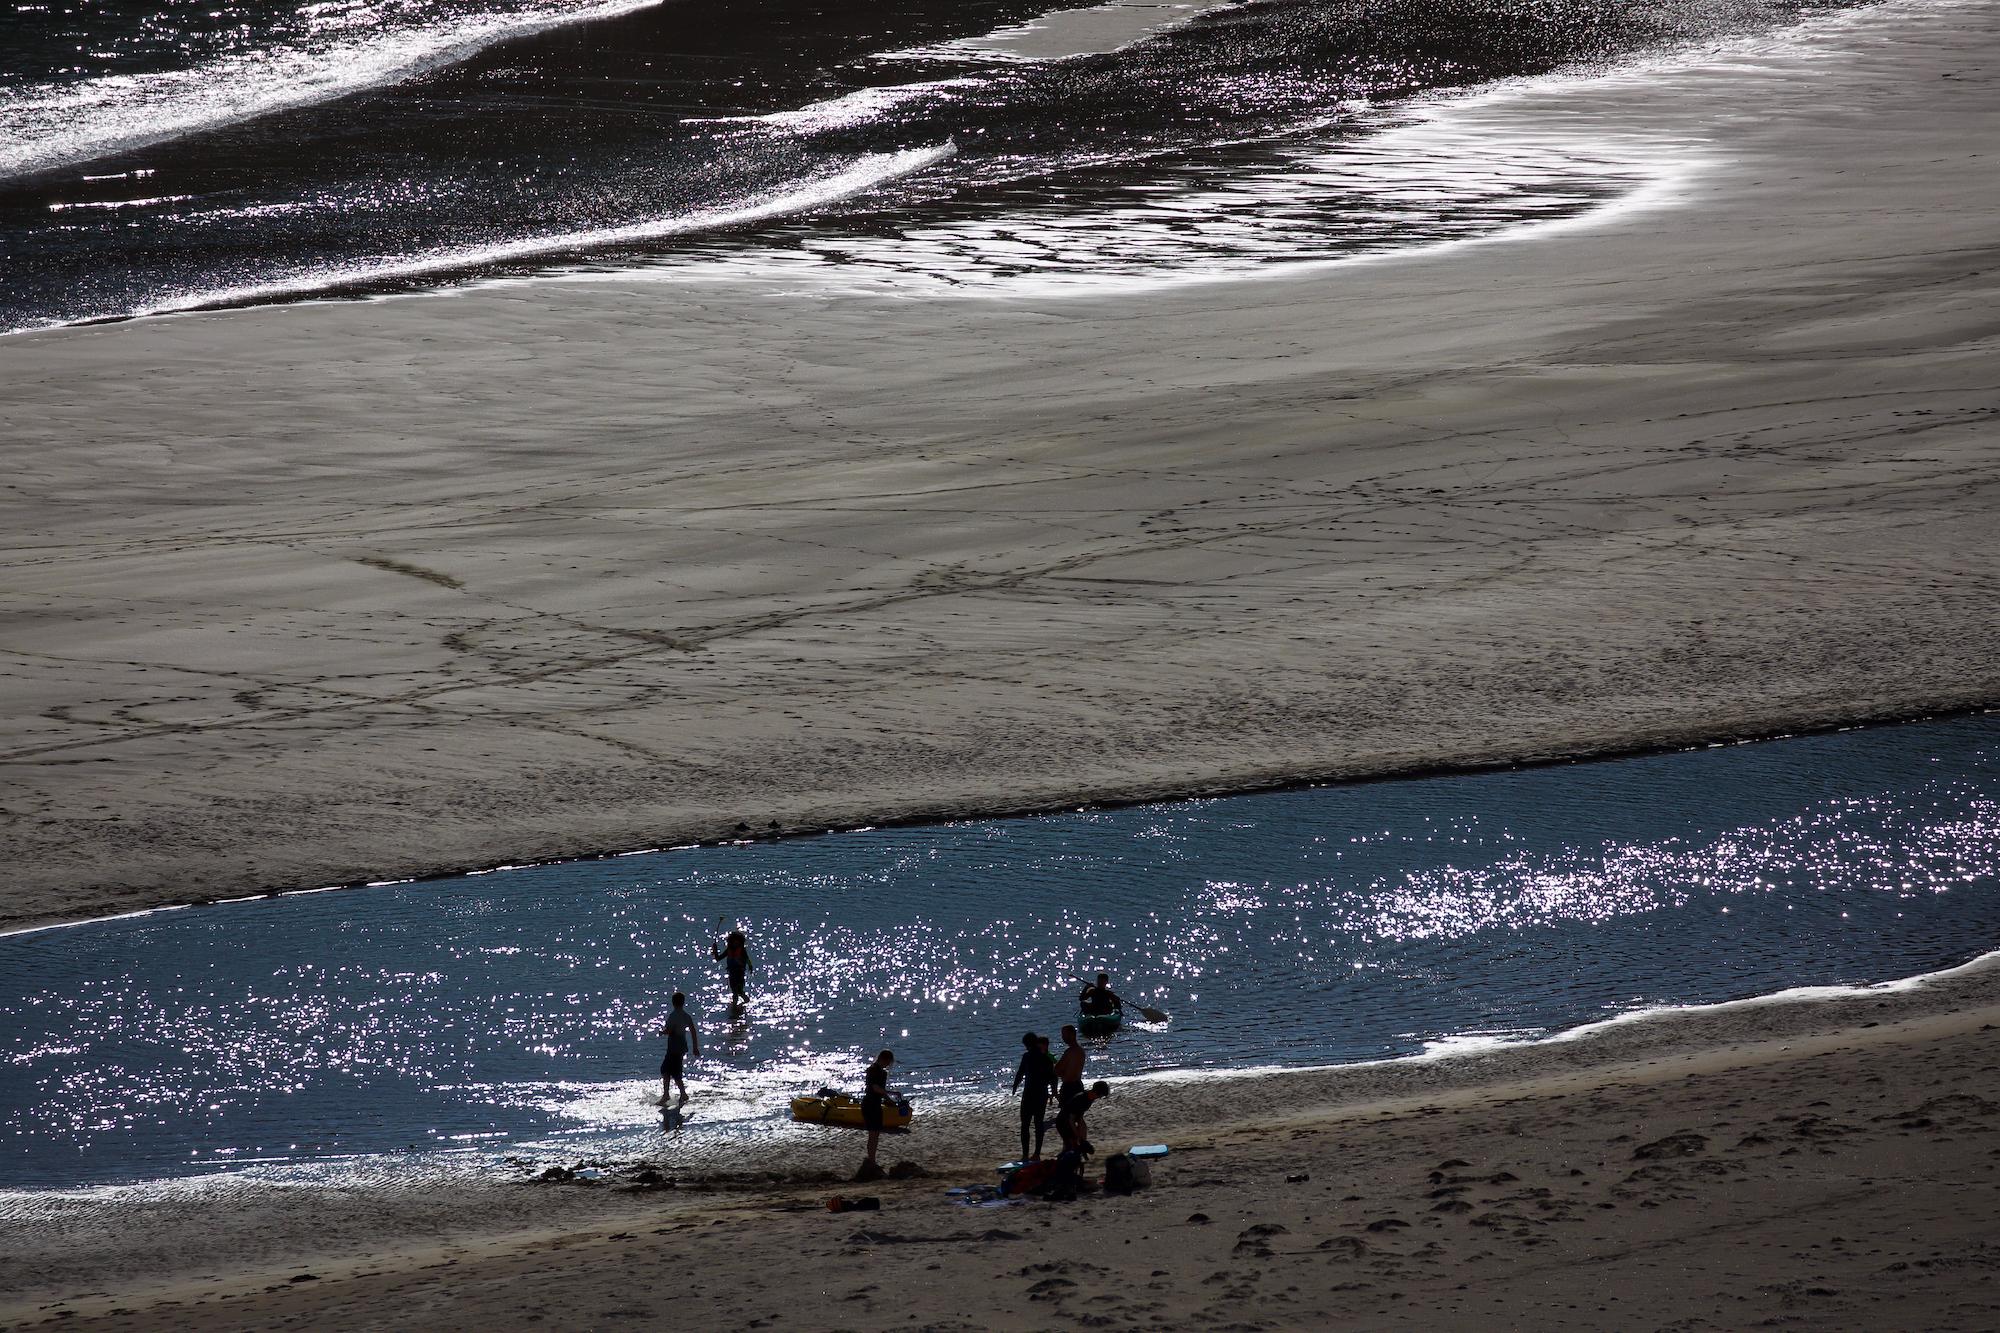 (165) (PO) Scottish Paradise, Beach at Bagh a' Phollain, Polin, Kinlochbervie, Cape Wrath, Scotland.jpg